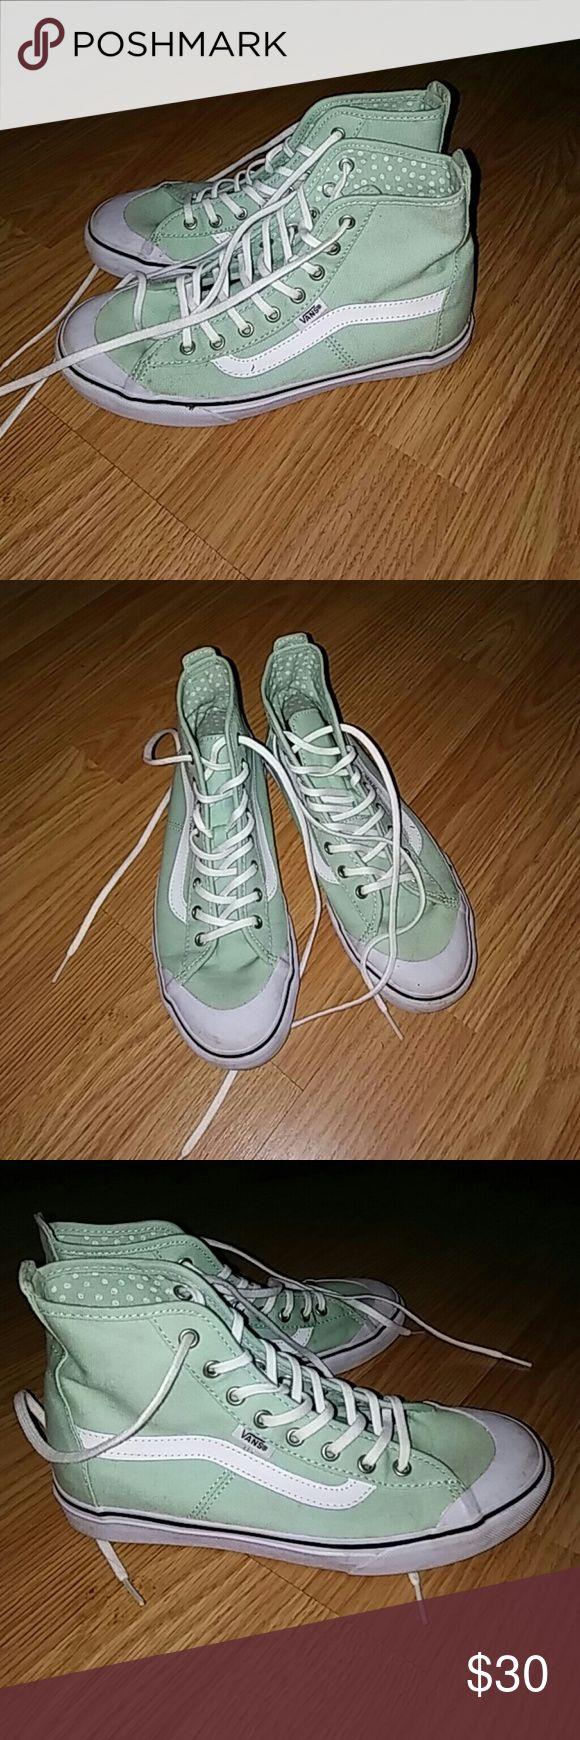 Vans Mint green, size 6.5, only worn twice Vans Shoes